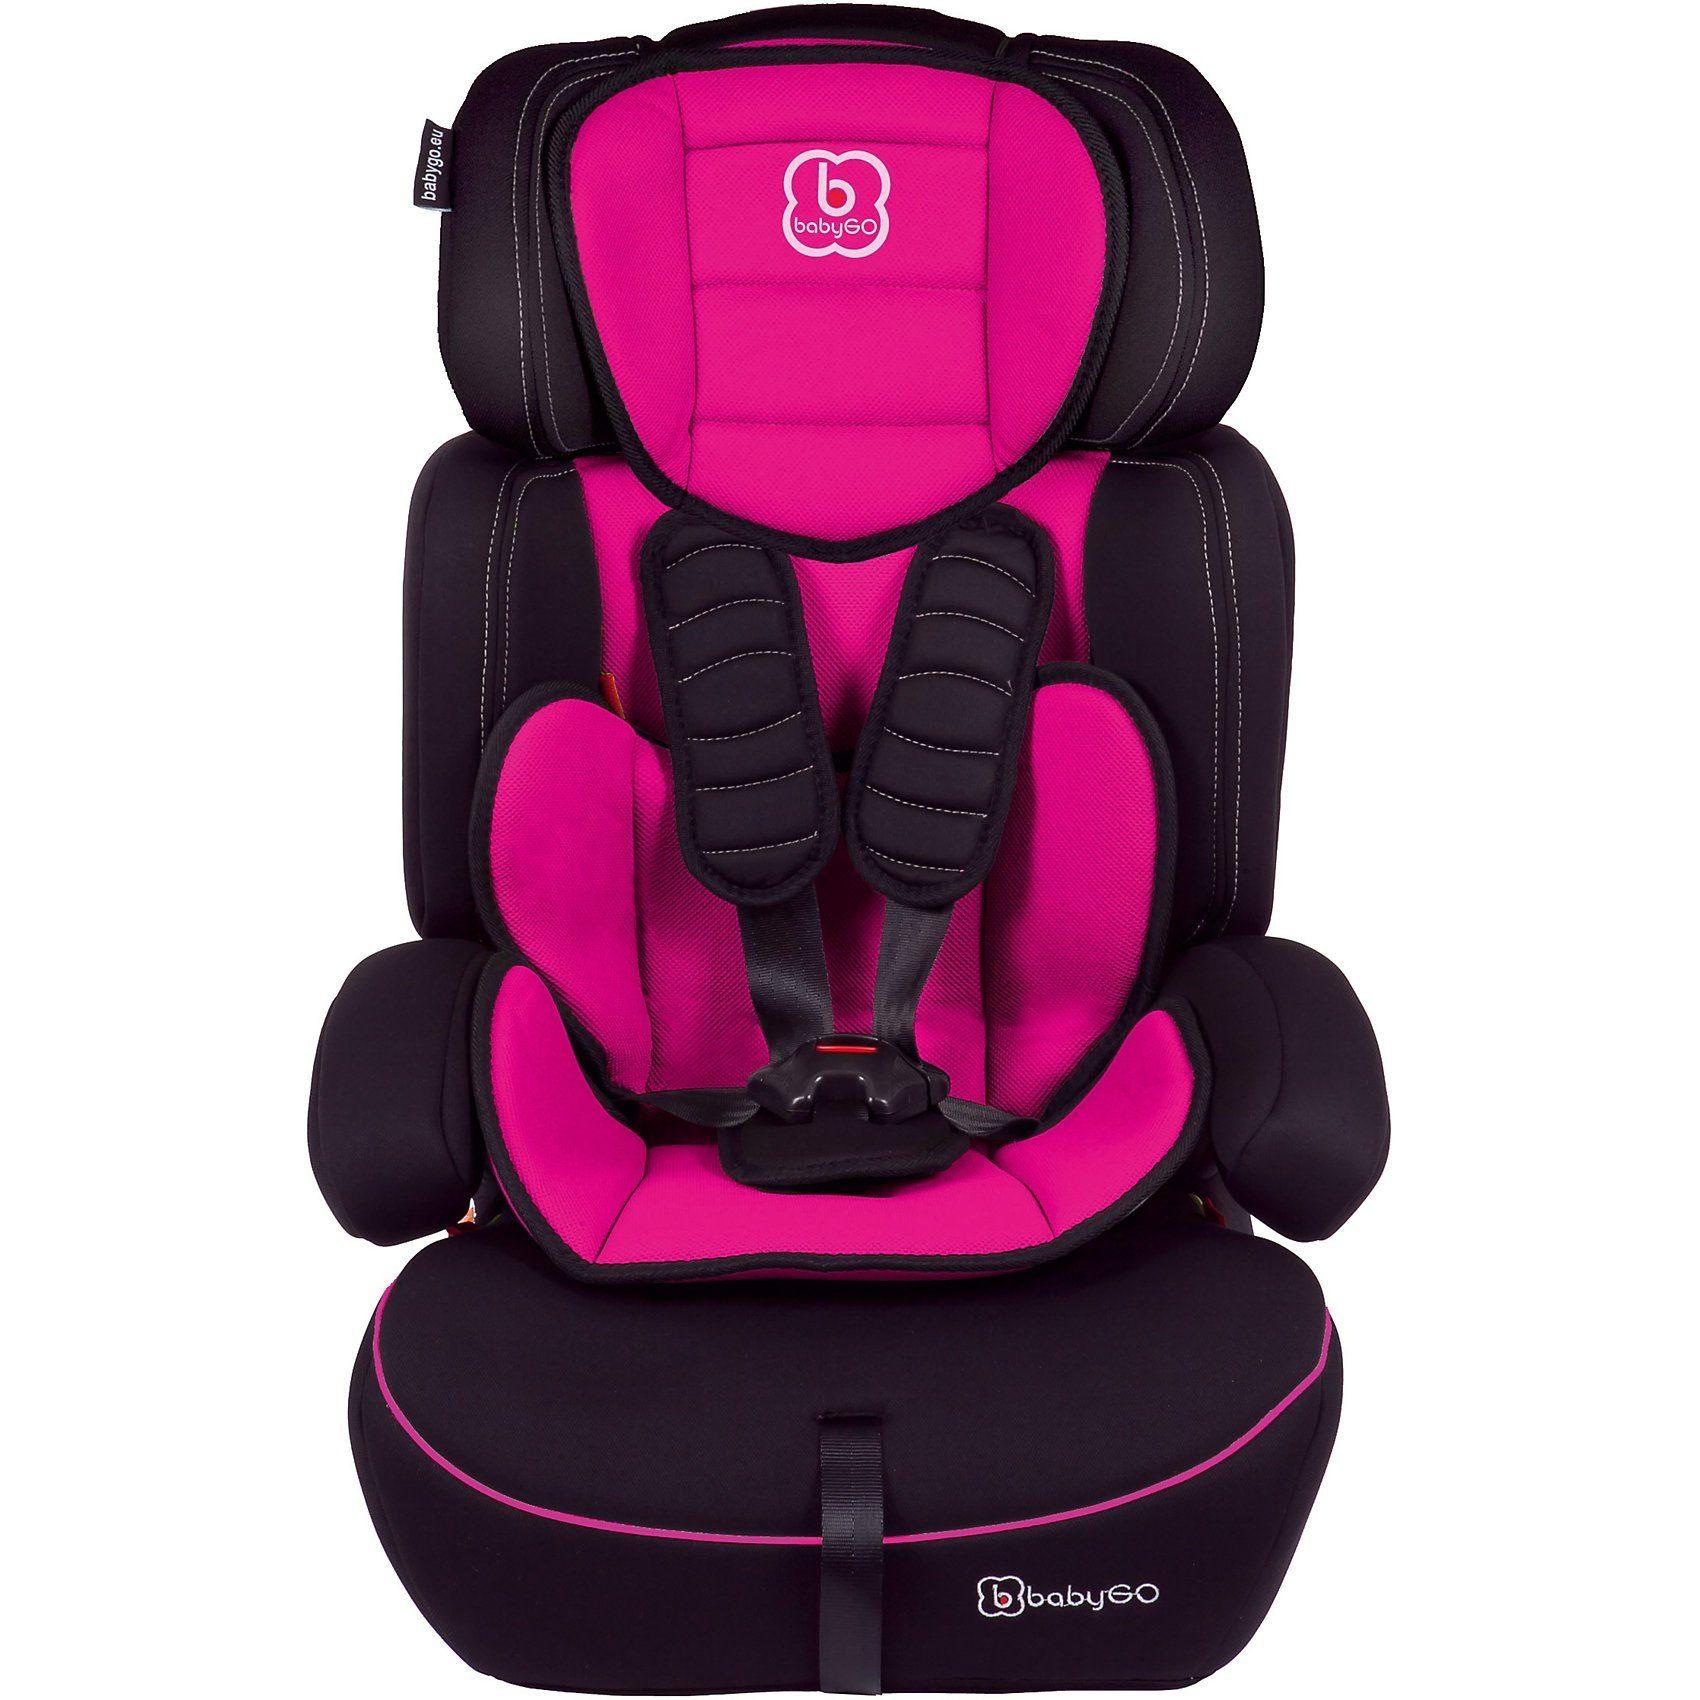 BabyGo Auto-Kindersitz FREEMOVE, pink, 2018